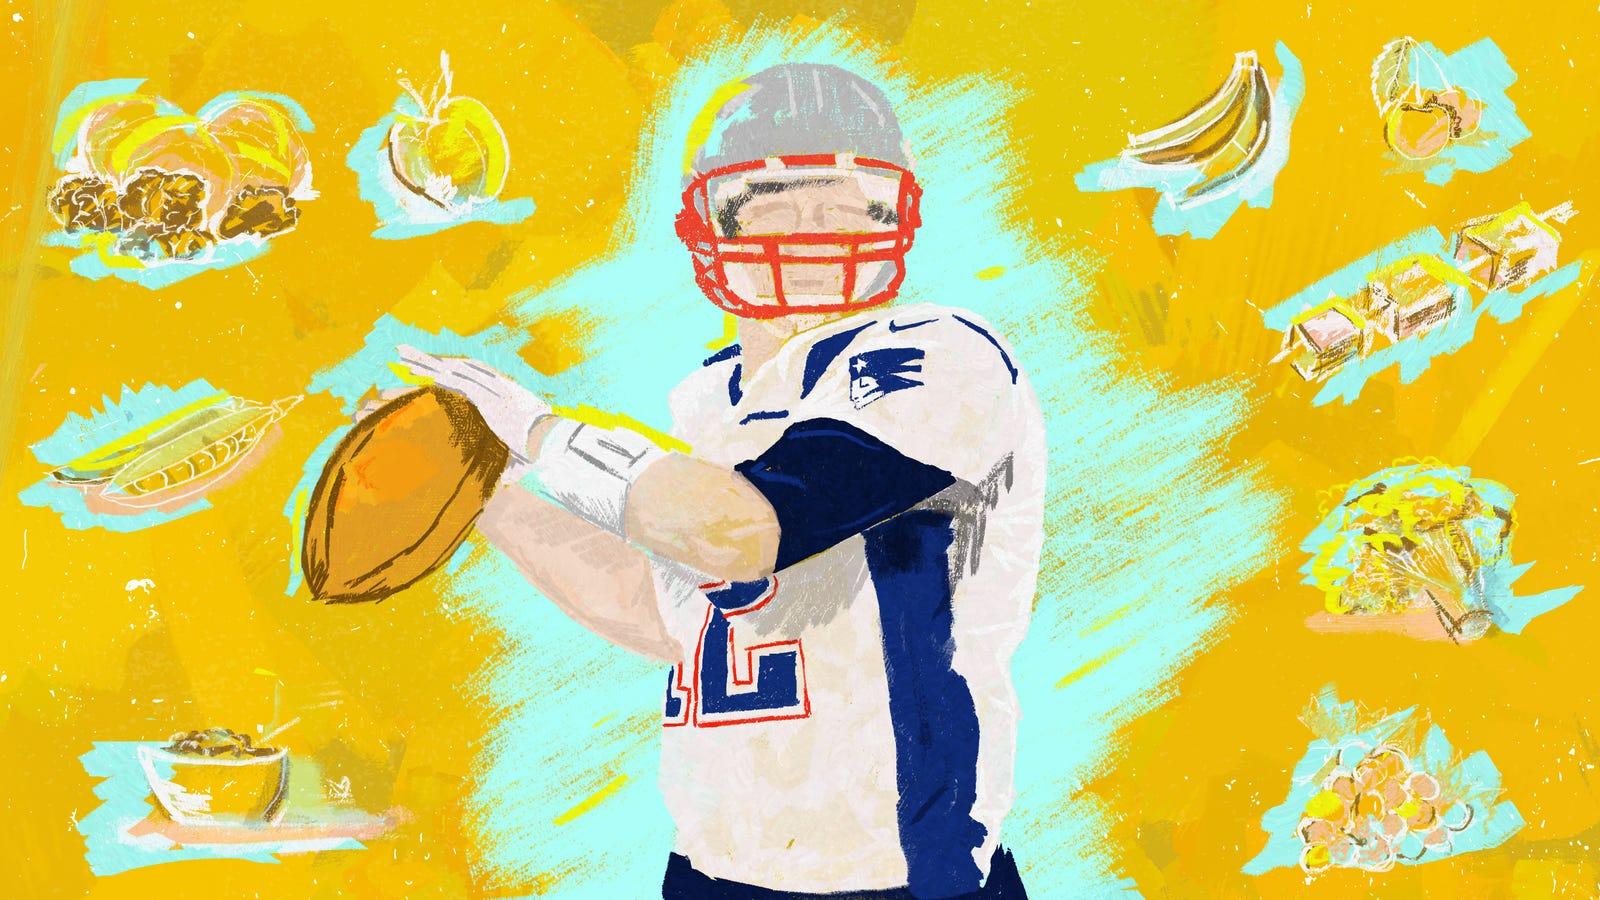 A Tom Brady hater tries Tom Brady's meal kits